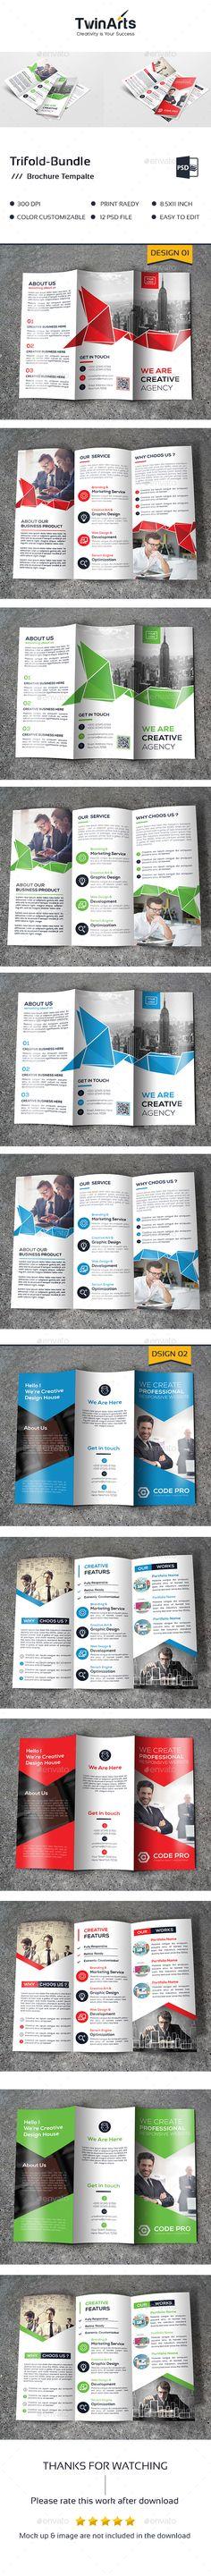 Trifold Brochure Bundle Templates PSD. Download here: https://graphicriver.net/item/trifold-bundle_2-in-1/17624037?ref=ksioks